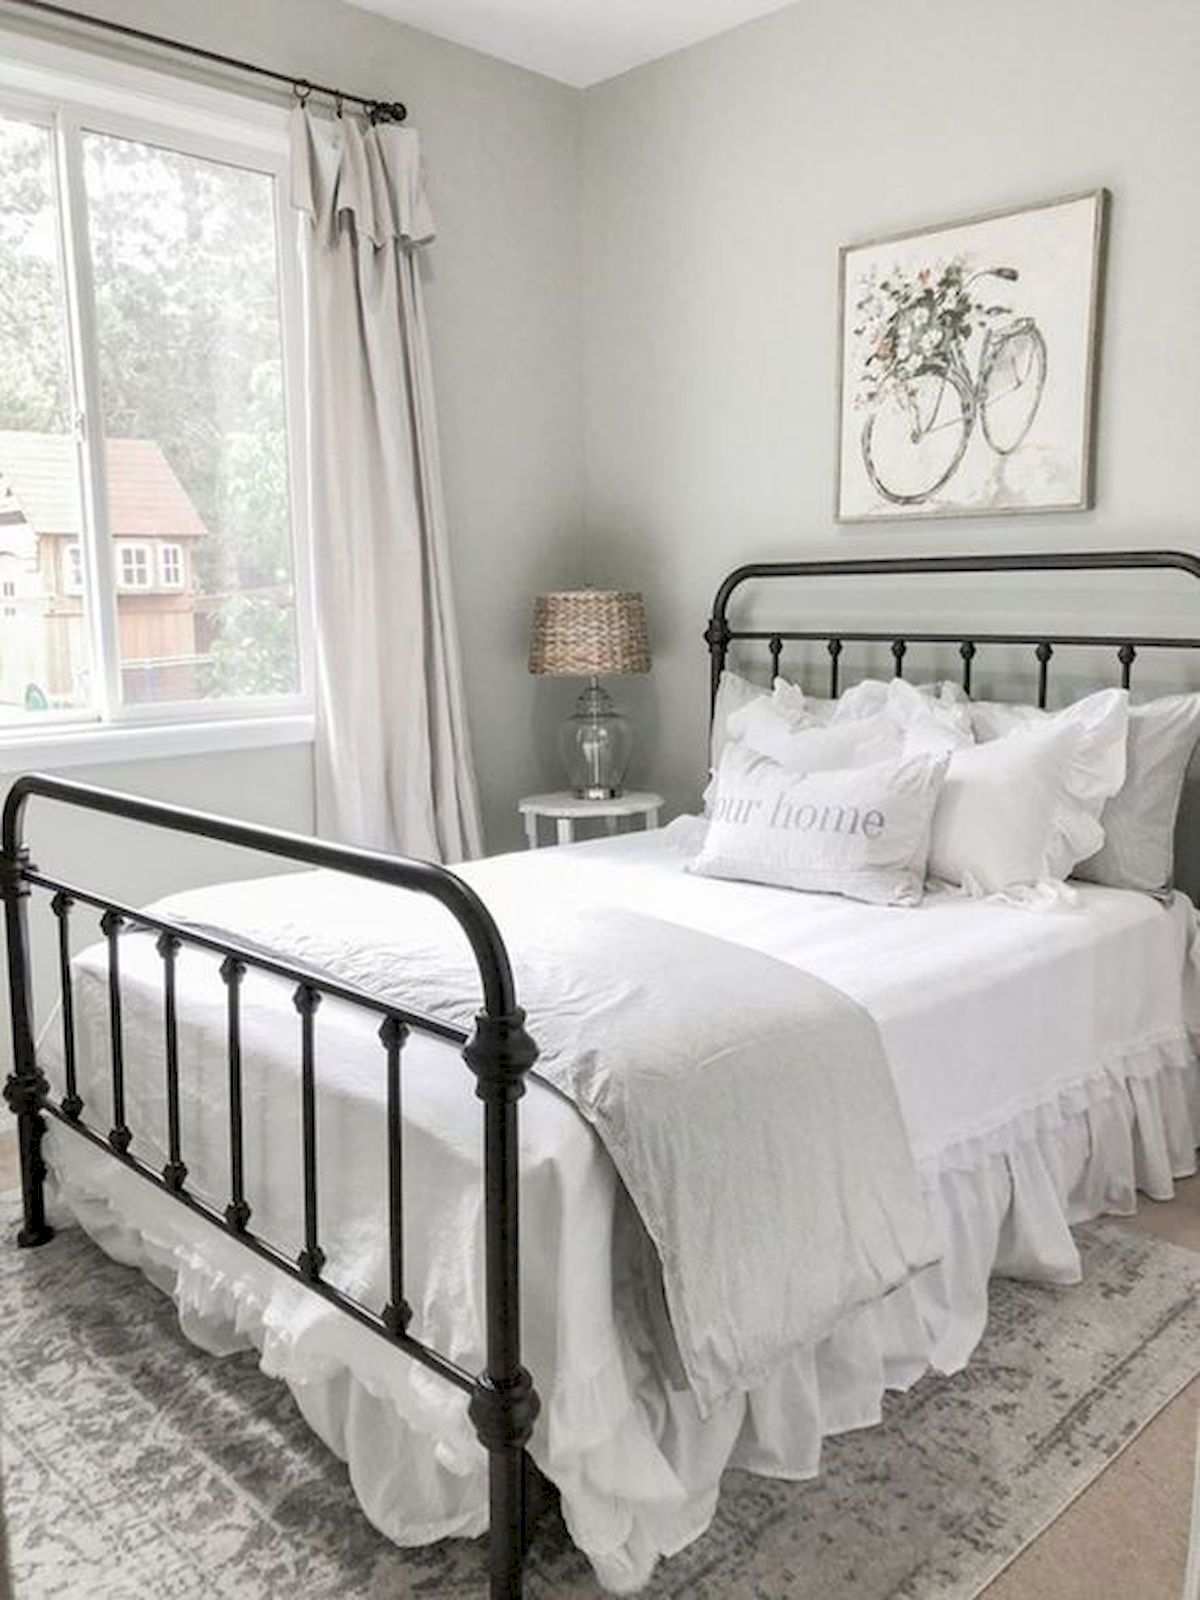 60 Beautiful Bedroom Decor and Design Ideas (33)